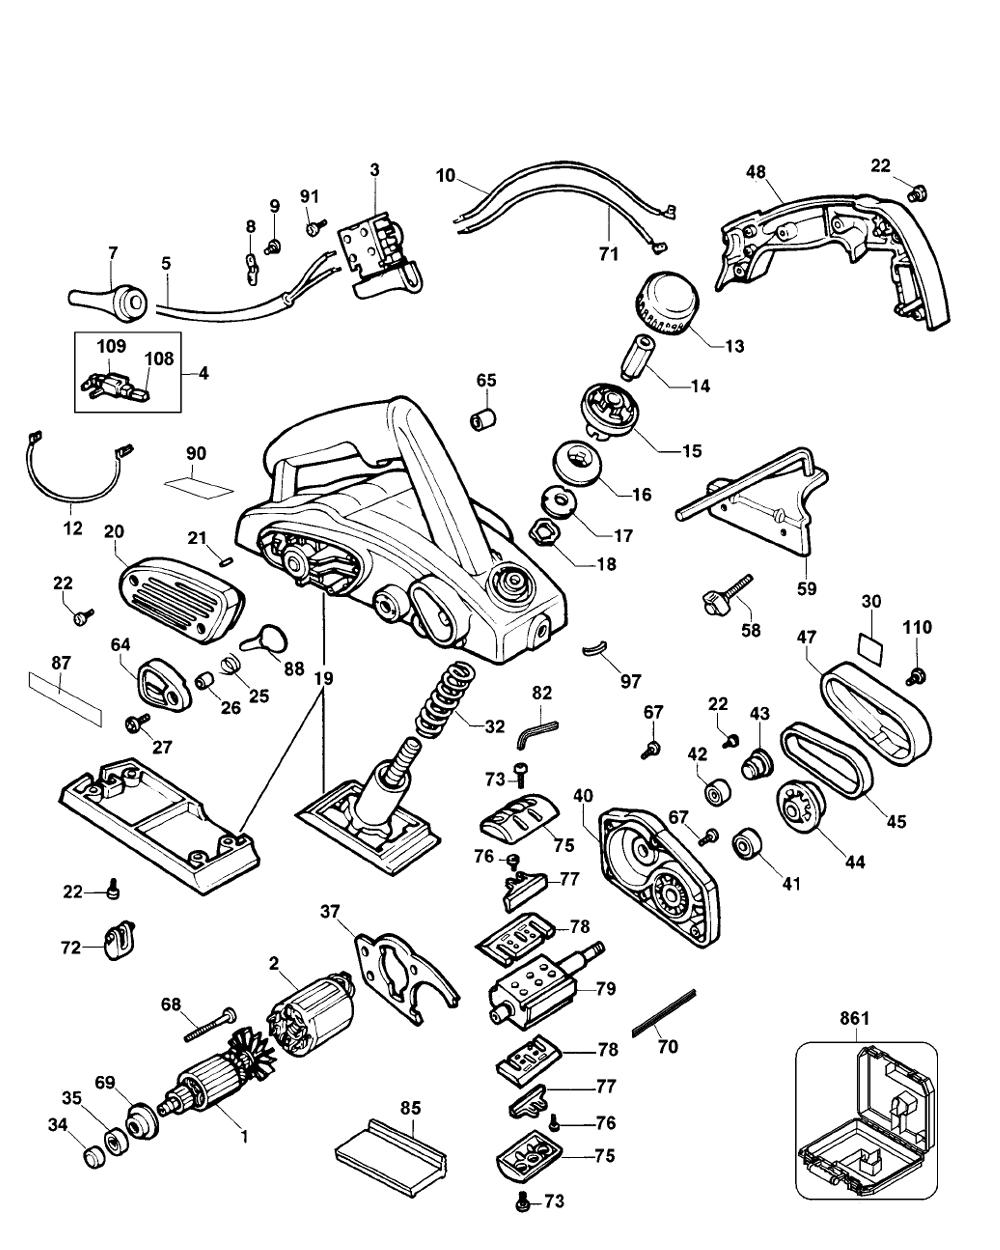 Power Sentry Ps1400 Wiring Diagram